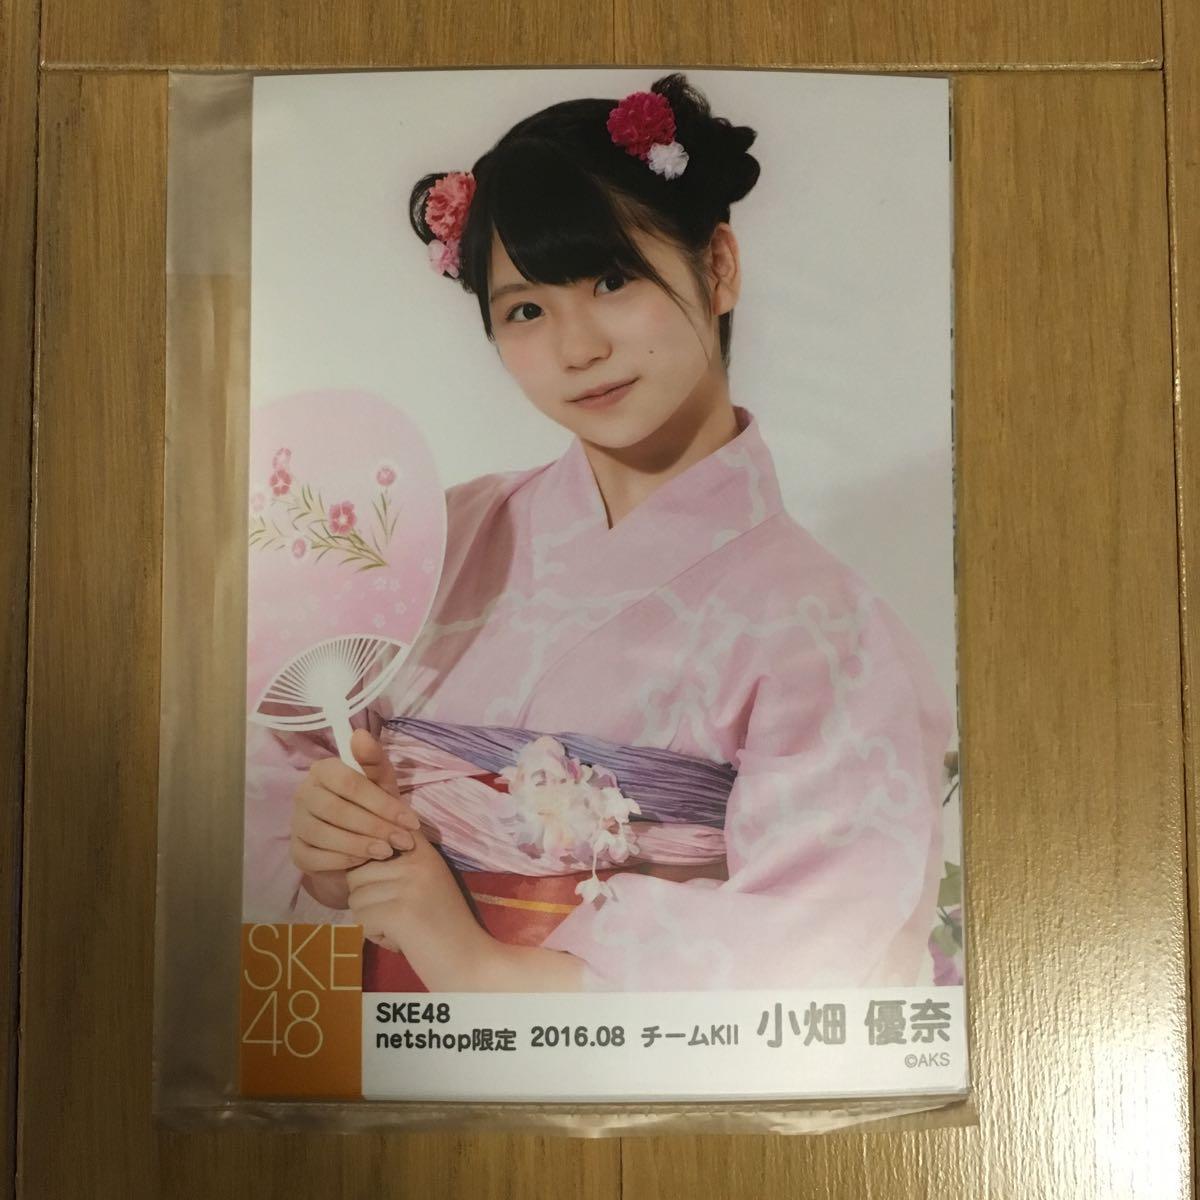 SKE48 小畑優奈 生写真 2016.8 netshop限定 5枚コンプ(未開封)